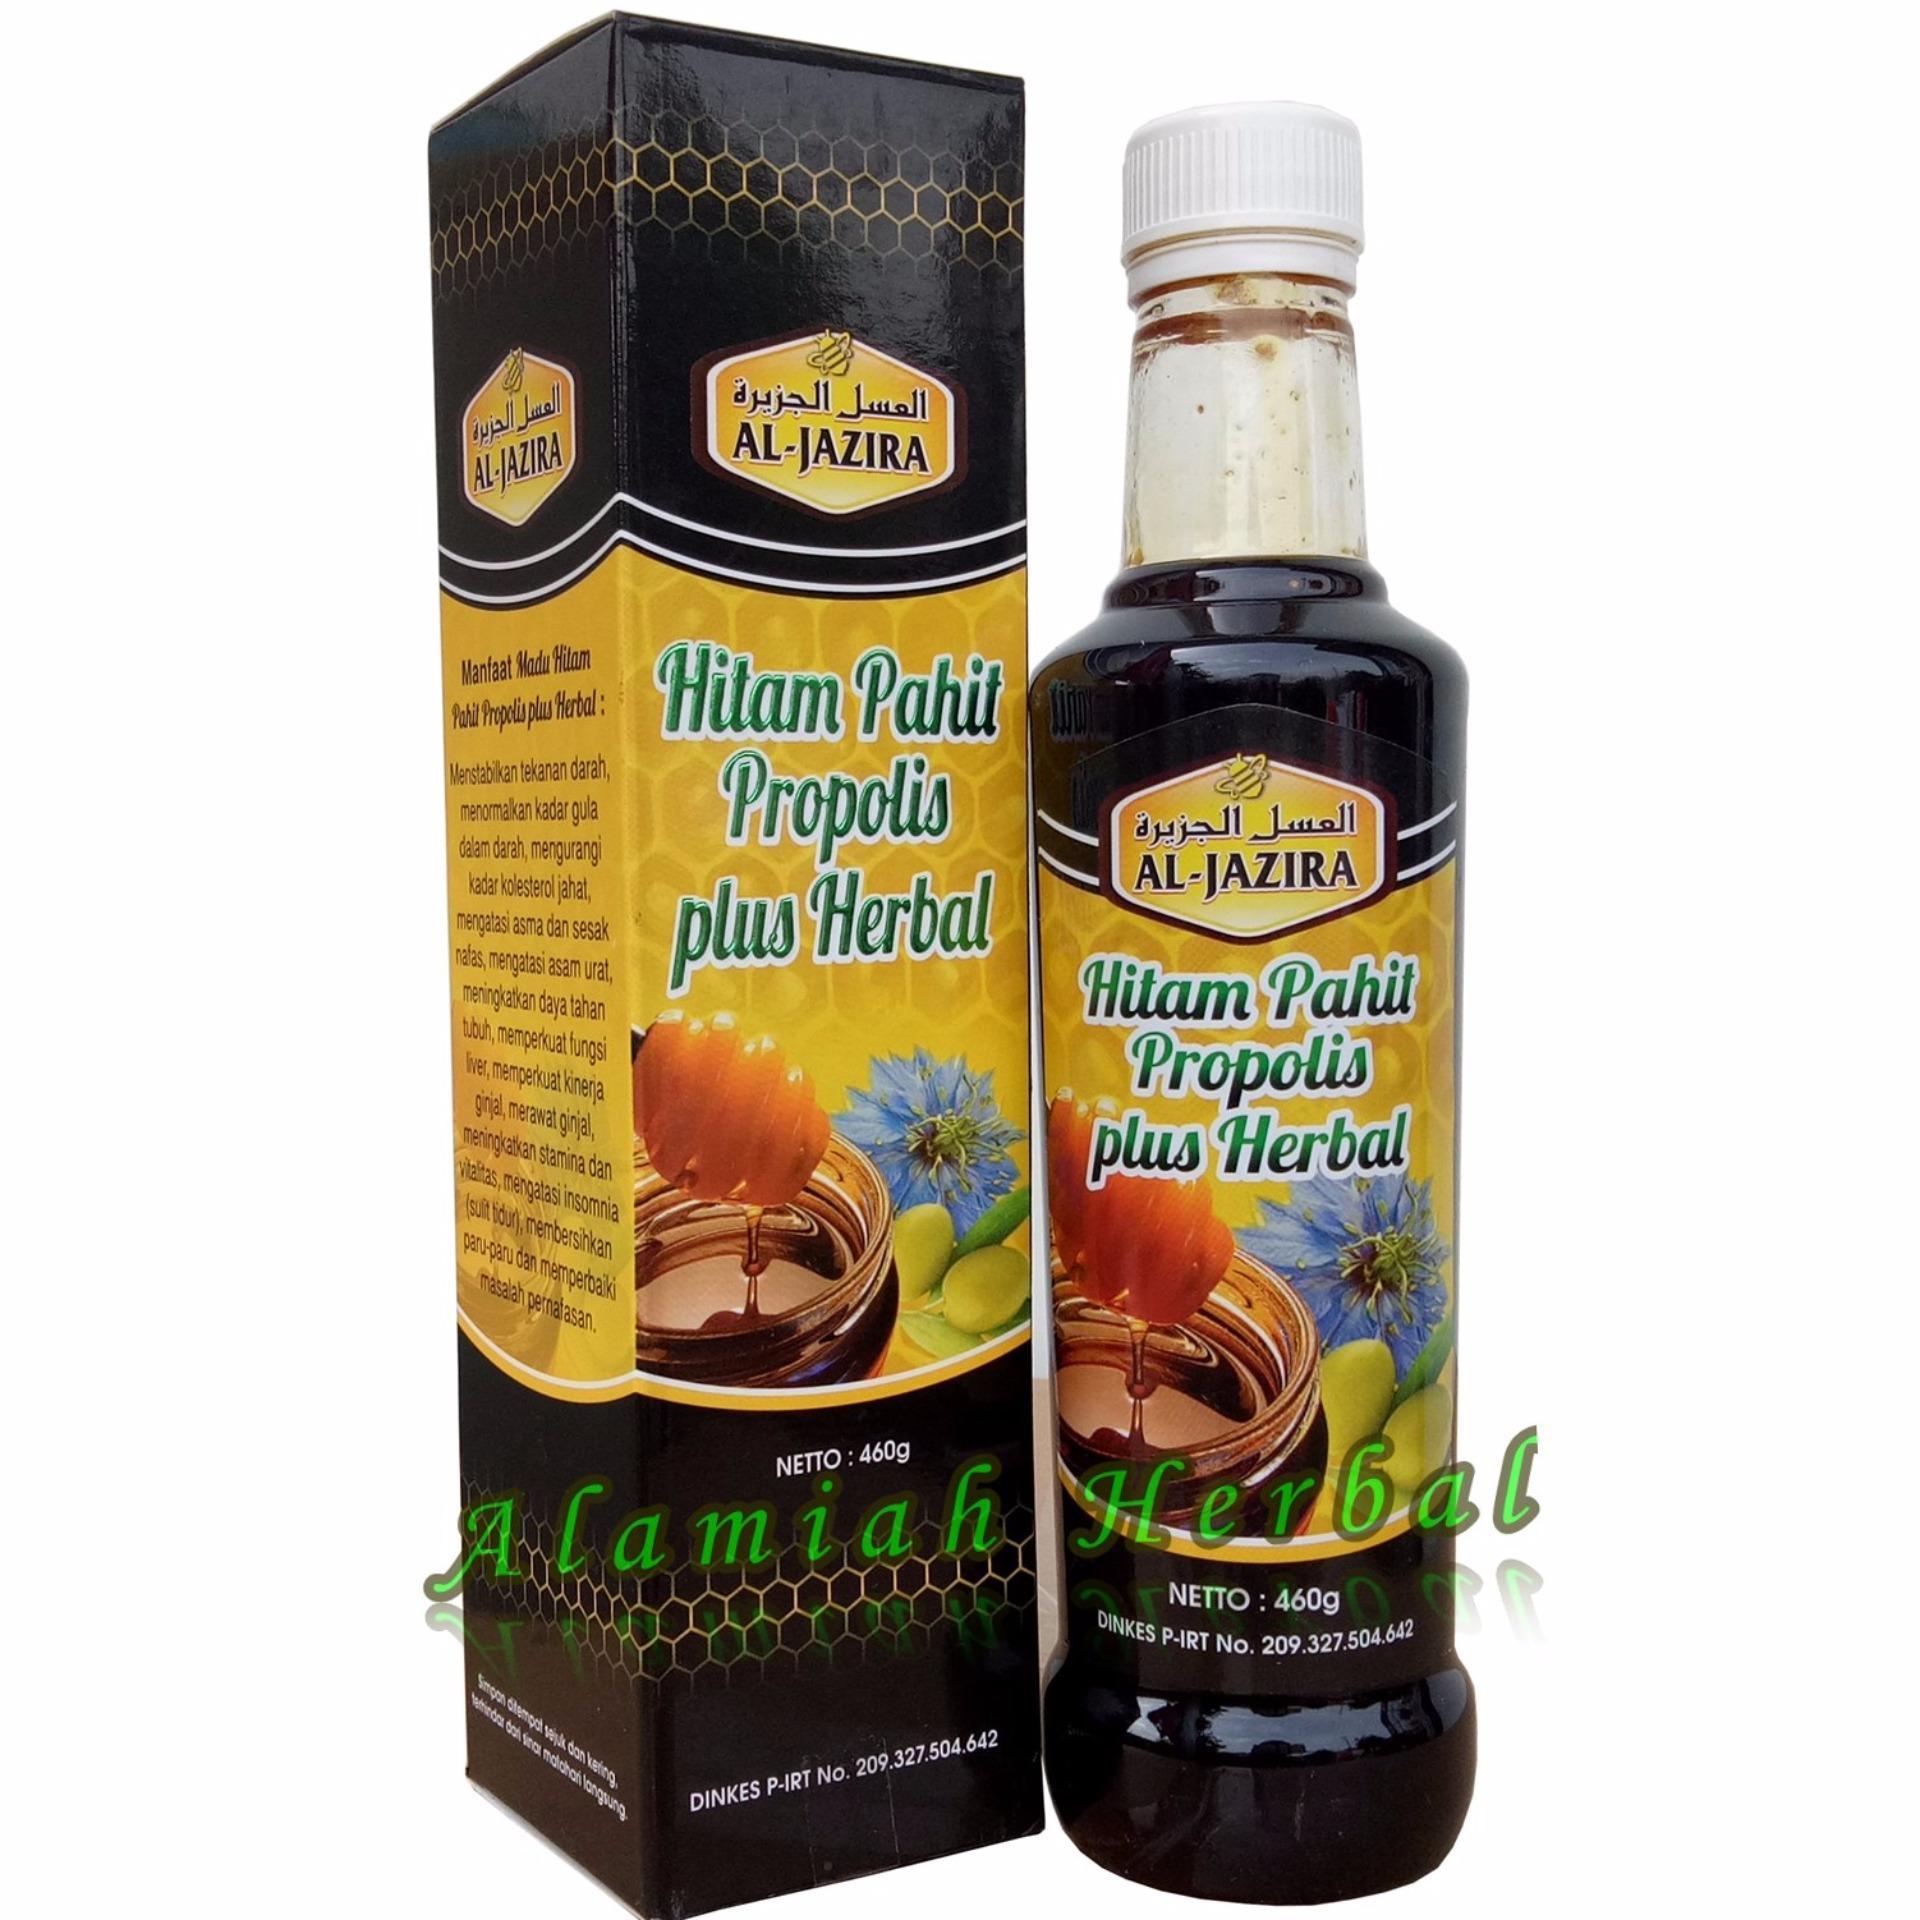 Flash Sale Madu Hitam Pahit Propolis Plus Herbal 460gr Price Checker Ter Ar Rohmah